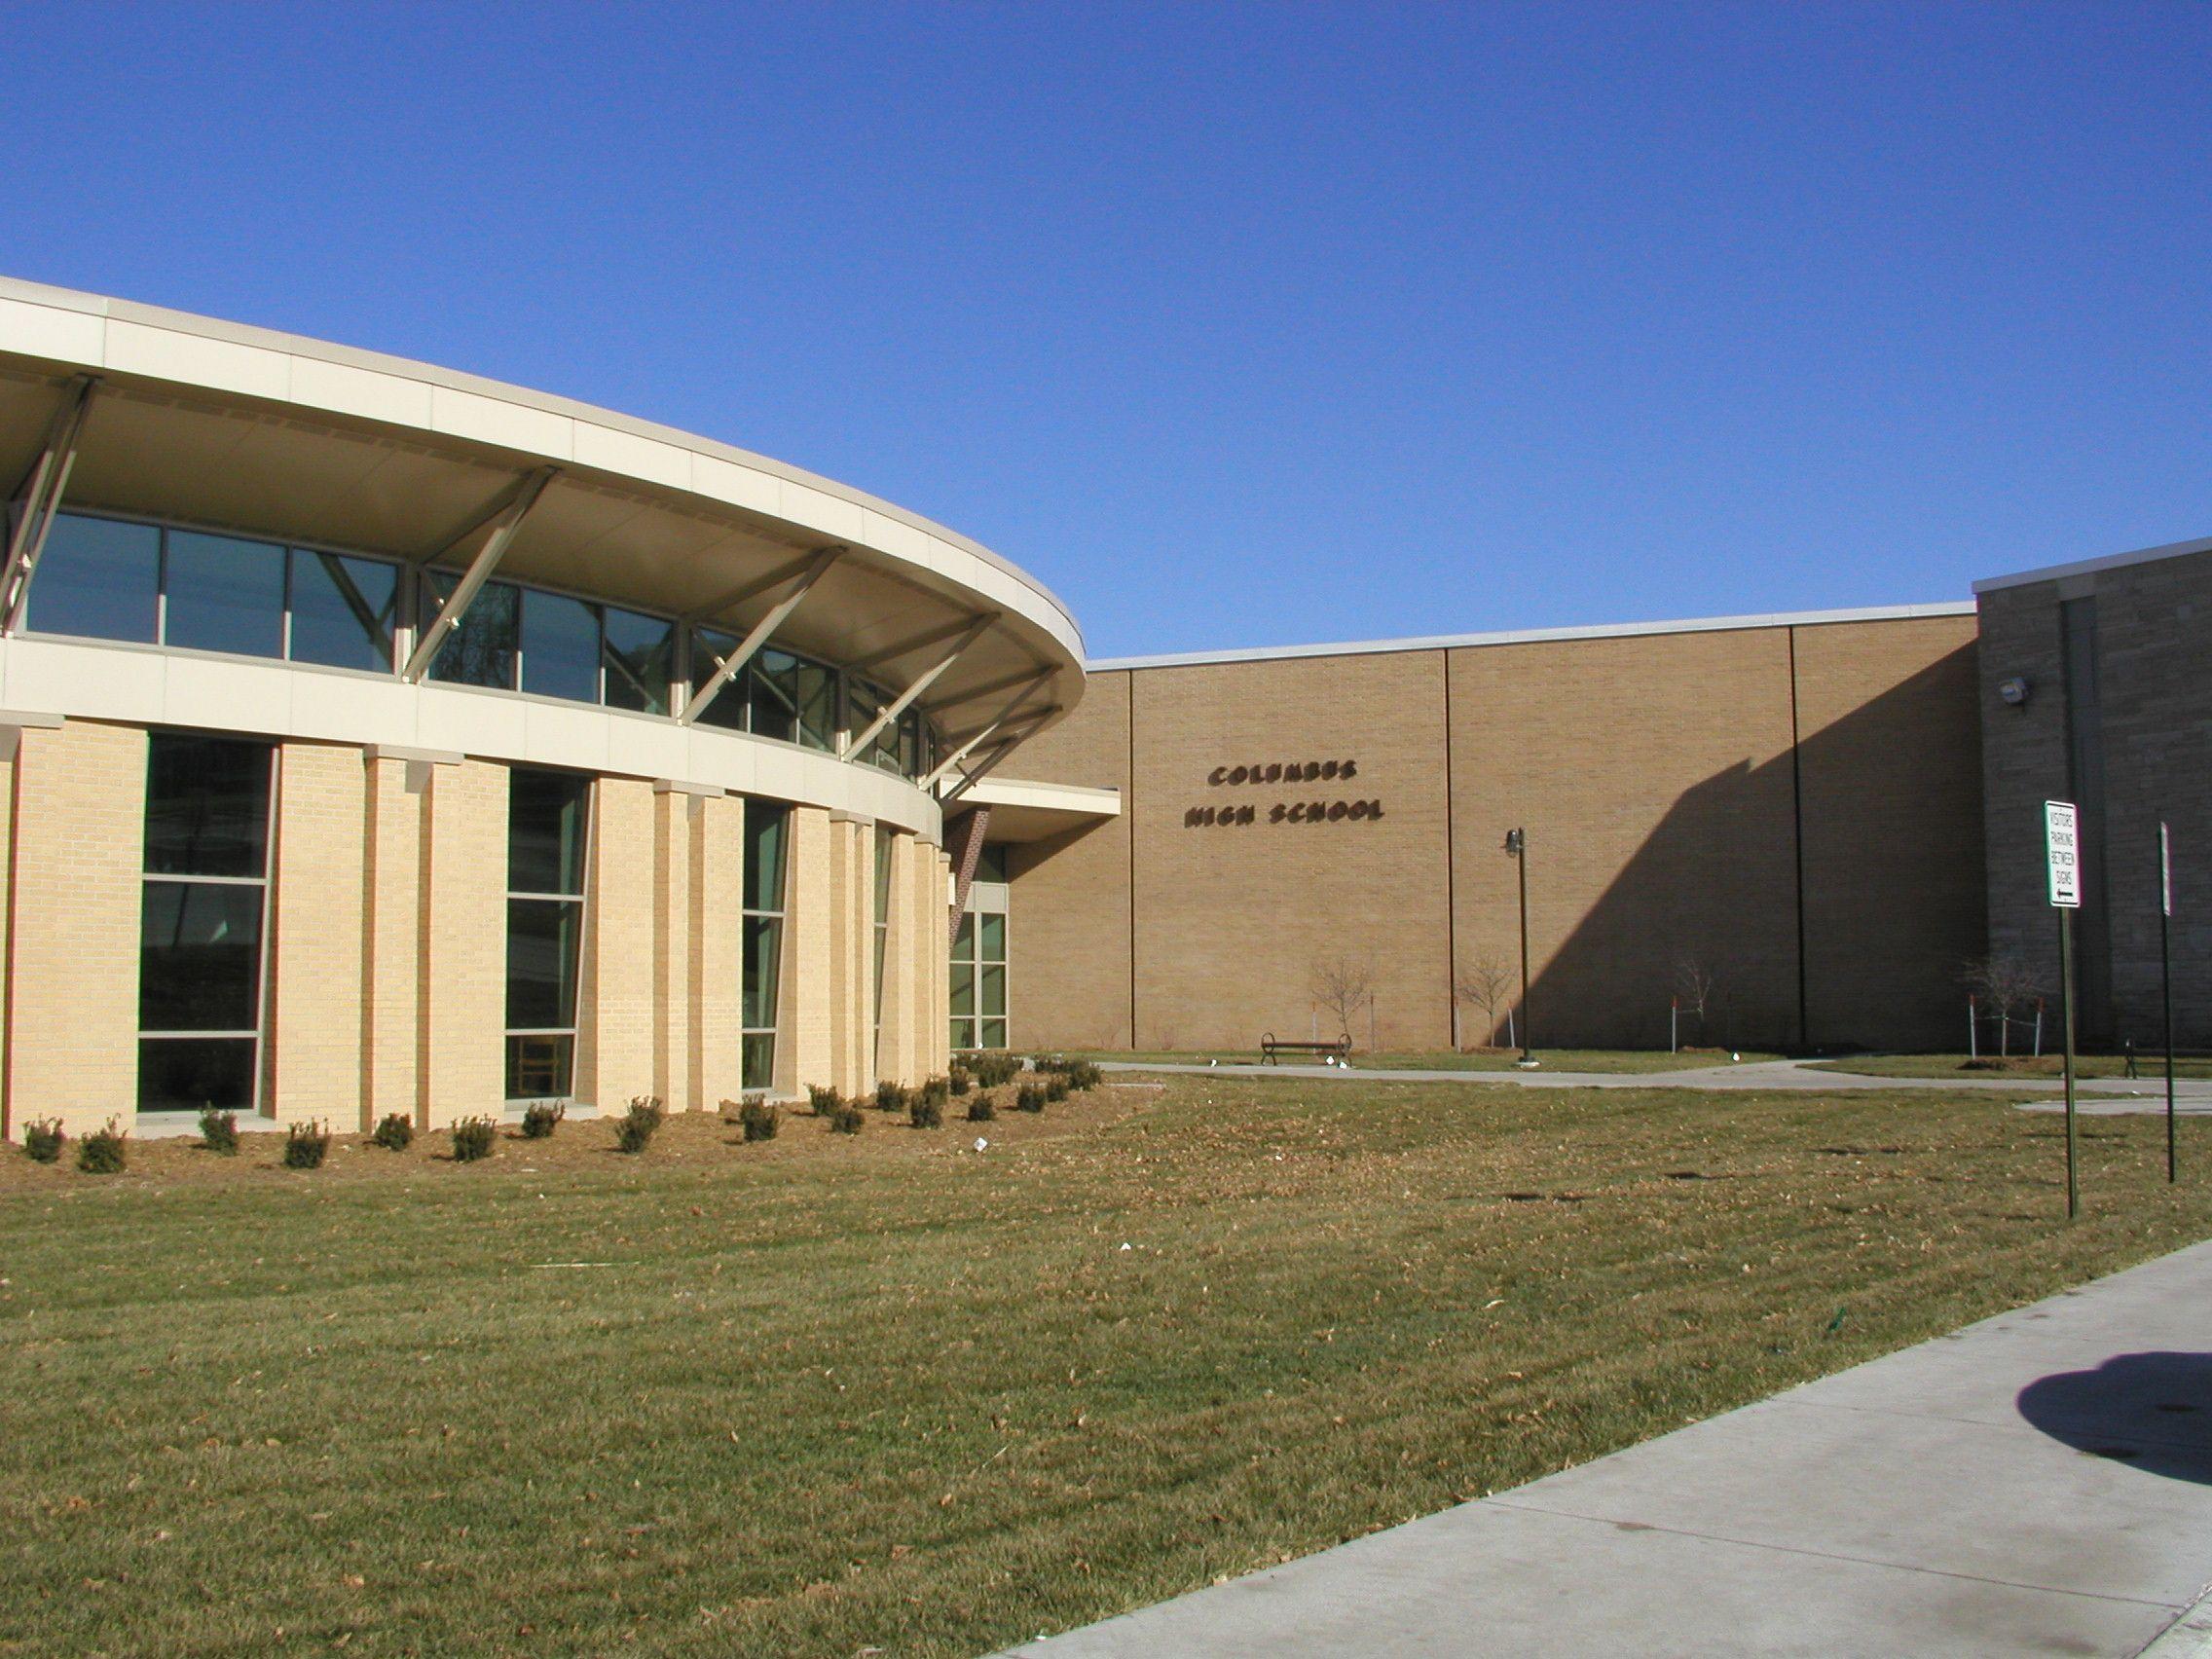 Columbus High School 2005-2016